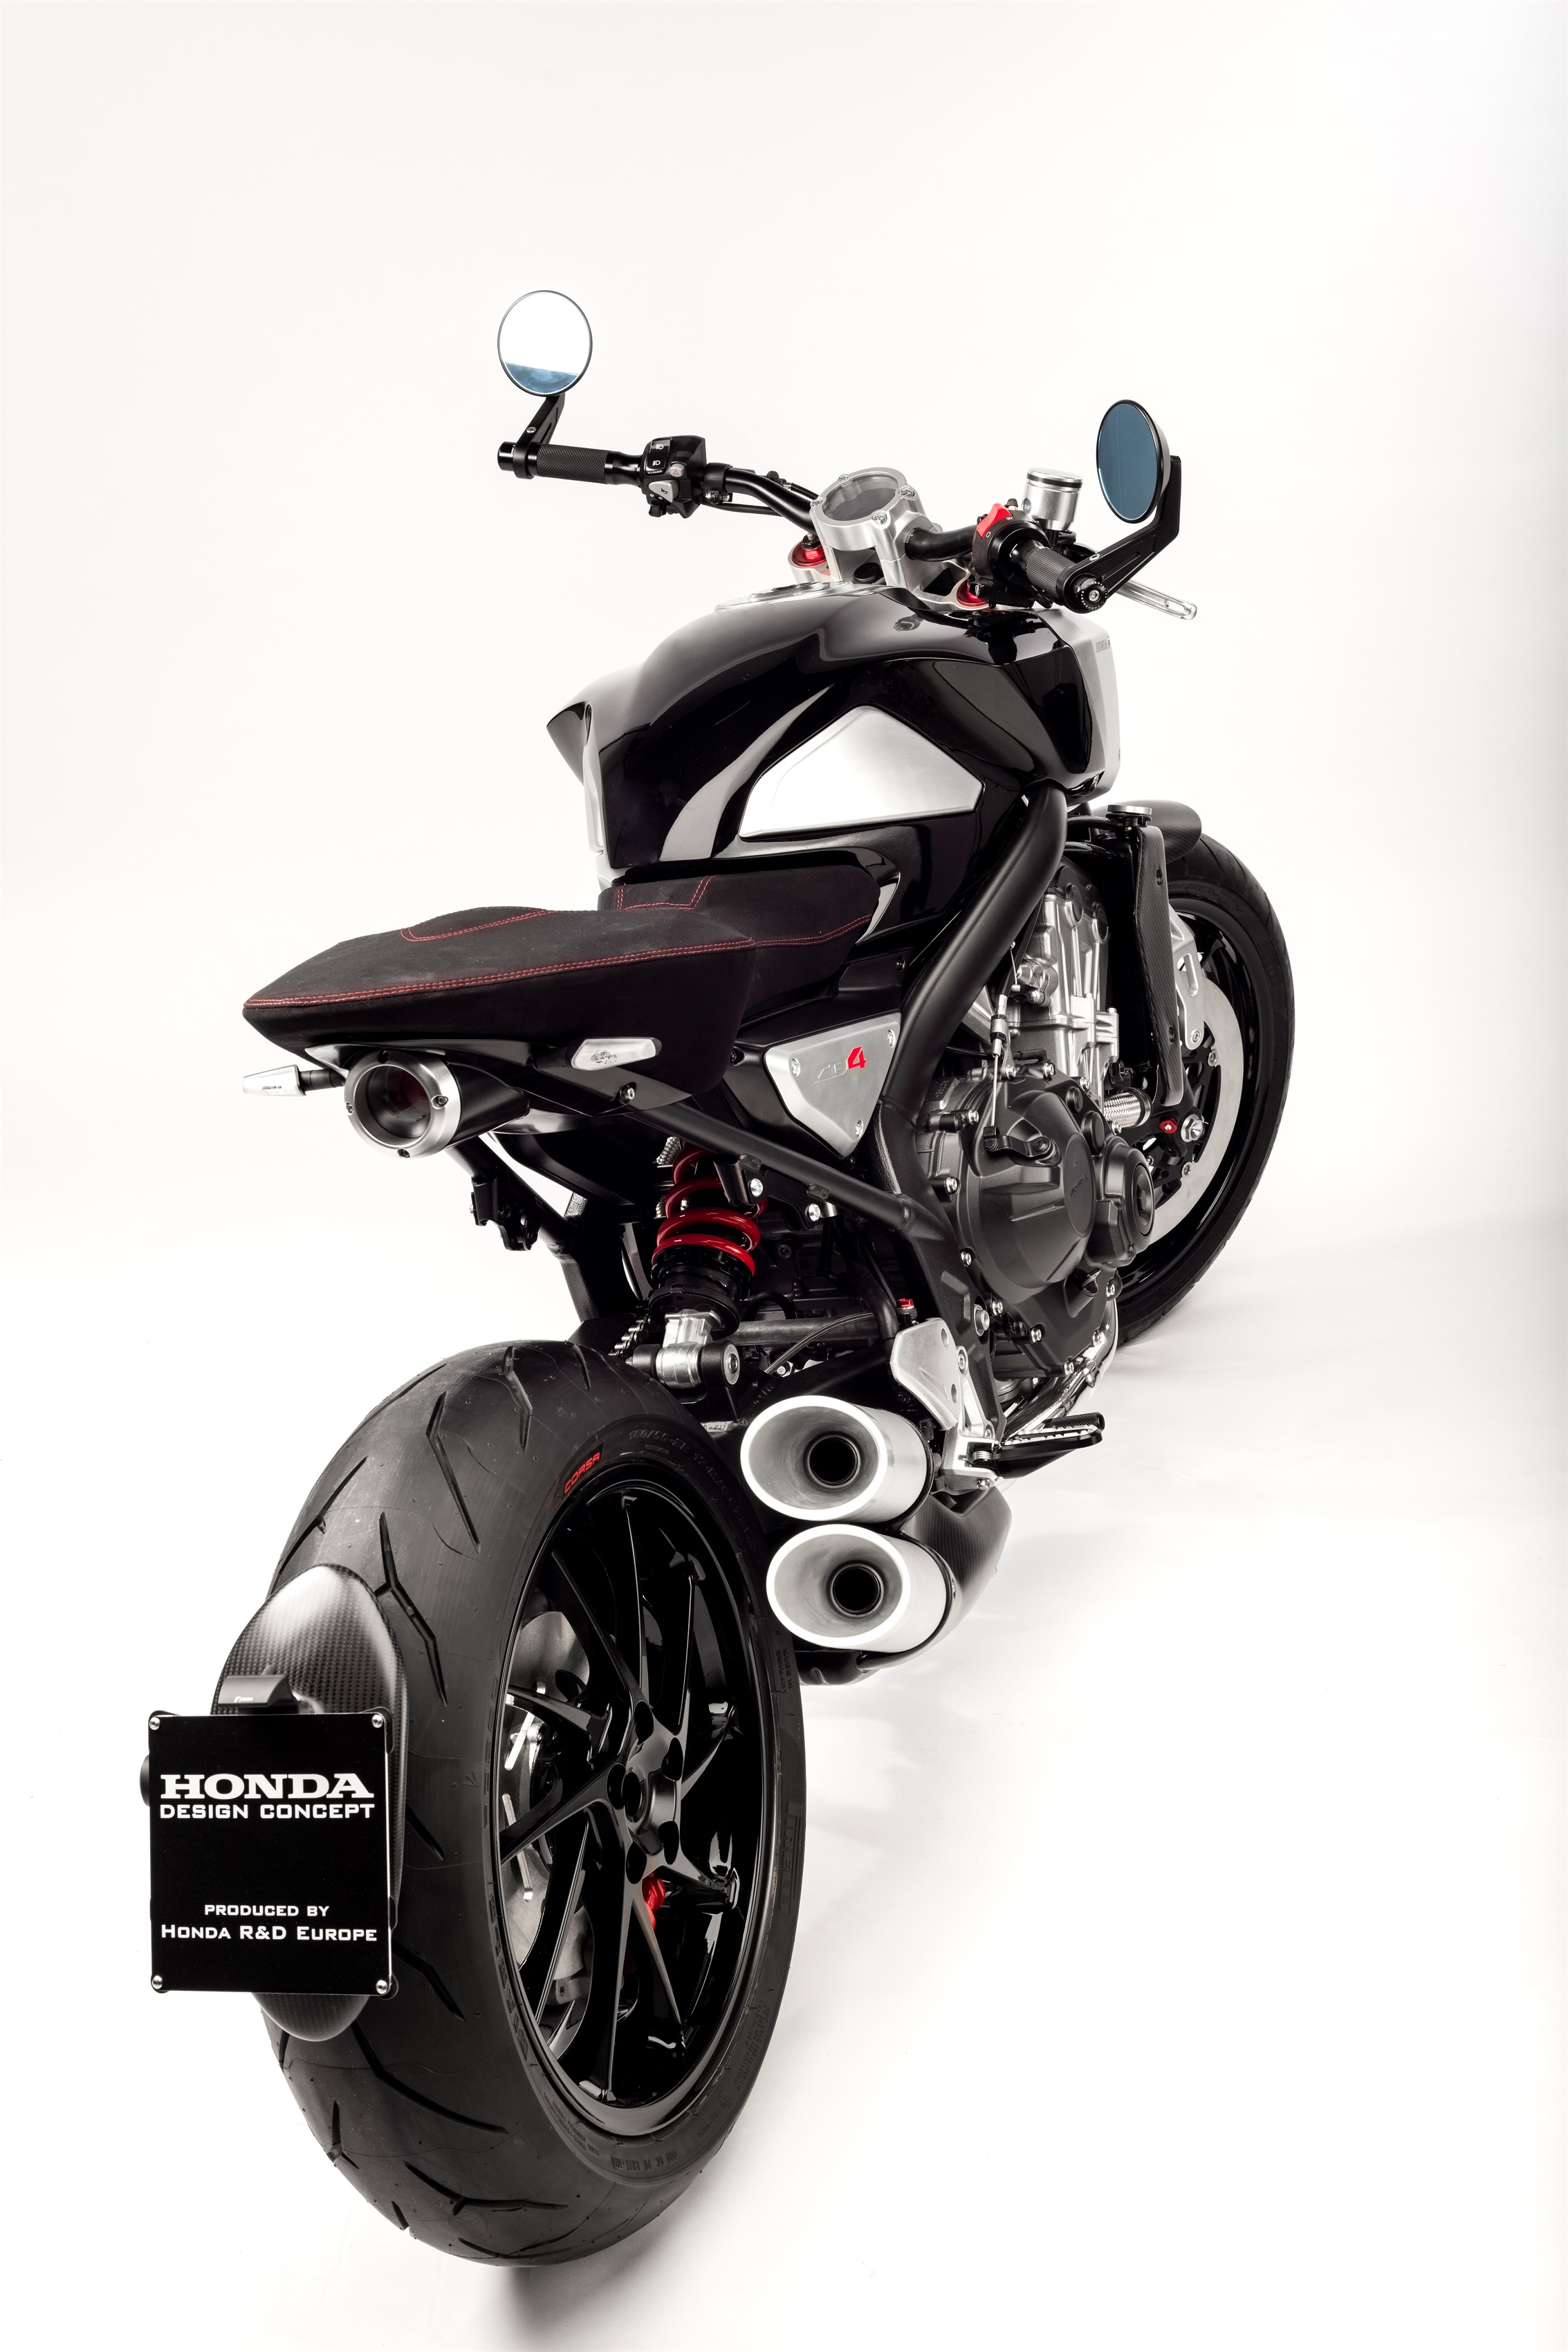 Honda's scrambler